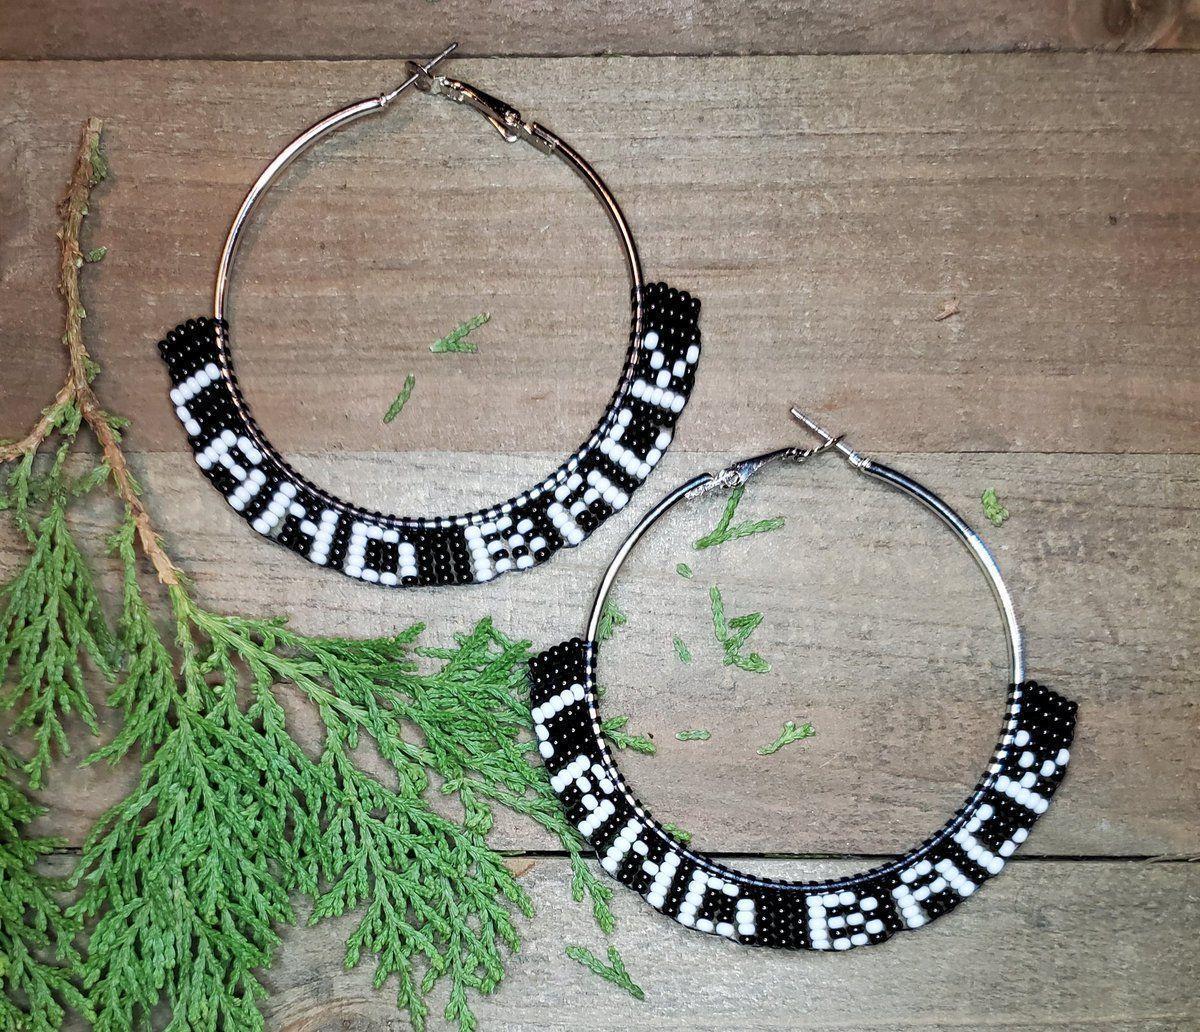 LAND BACK beaded hoop earrings available in my Etsy shop . #NativeTwitter #AlaskaNative #FirstNations #beadwork #NativeMade #BuyNative #Statimc #Unangax #Aleut #BeadedEarrings #LandBack